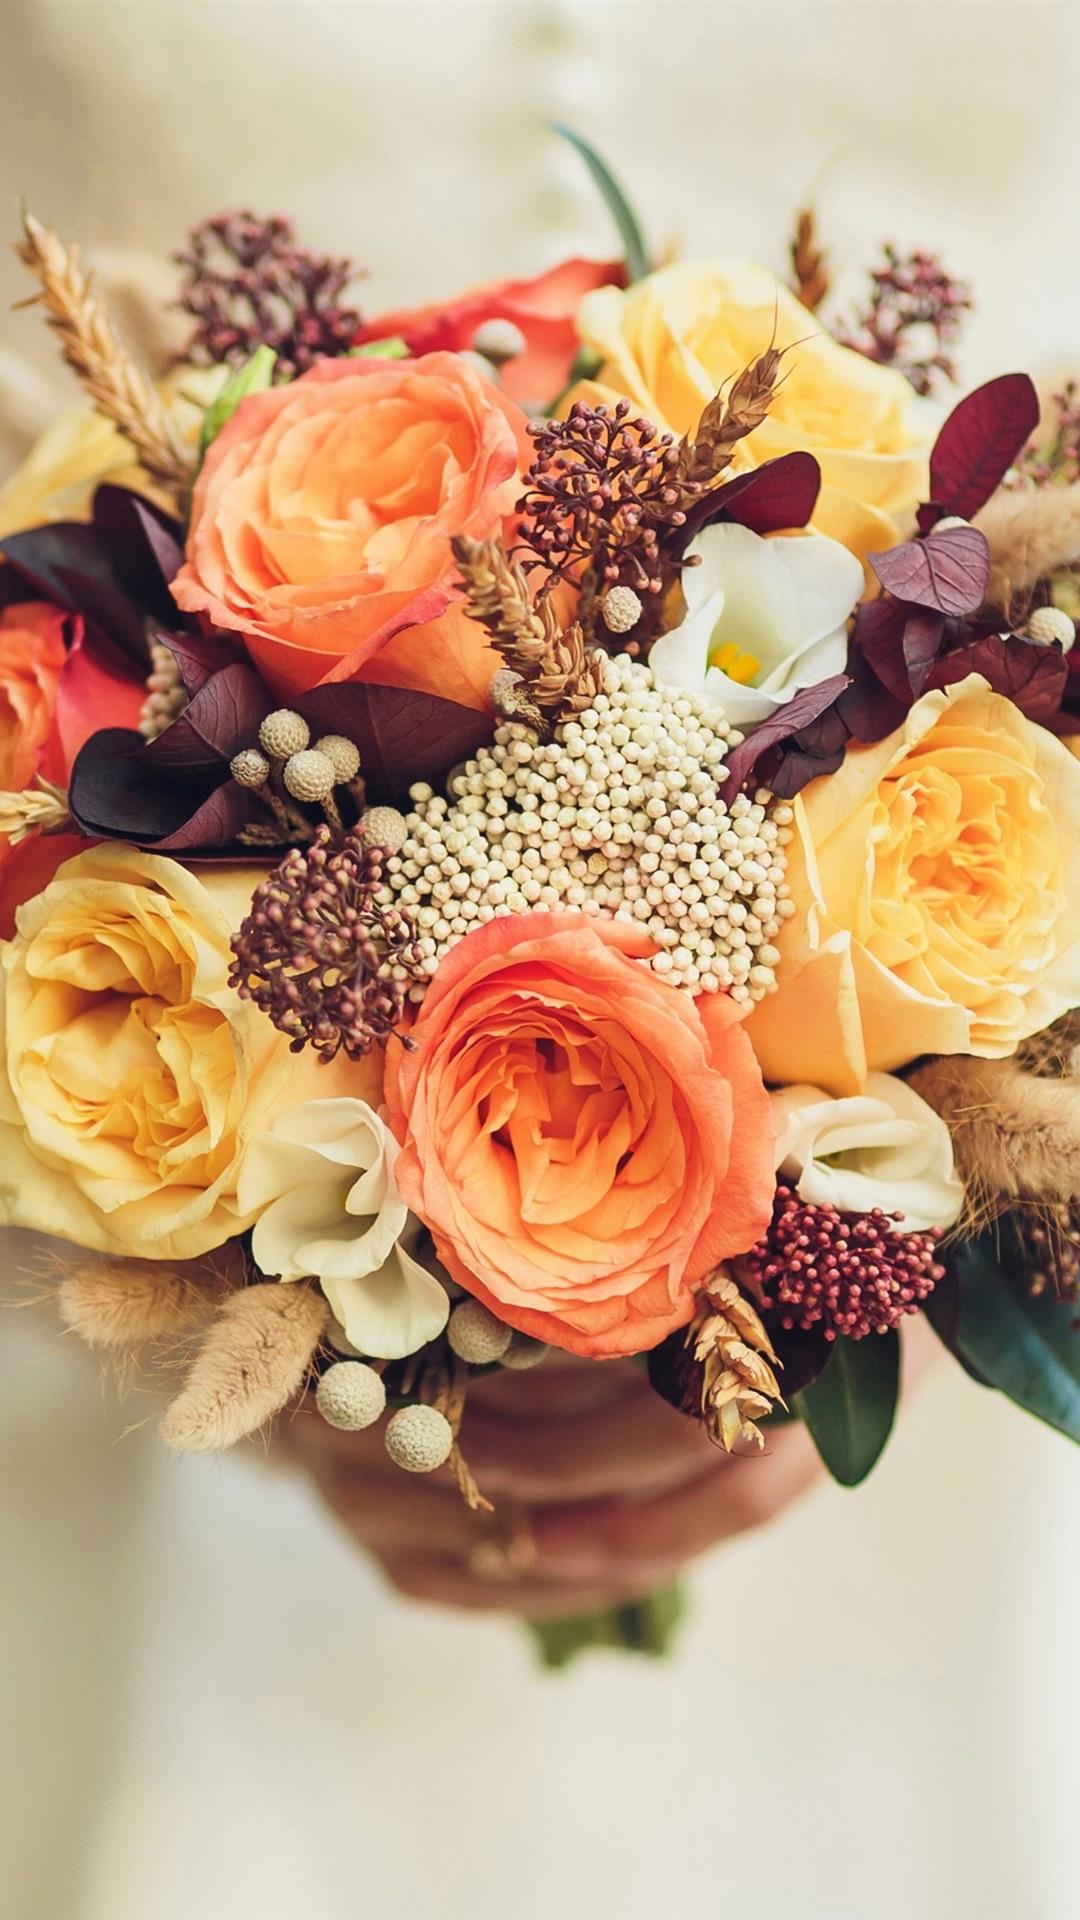 Bride Wedding Bouquet Flowers Rose 1080x1920 Iphone 87